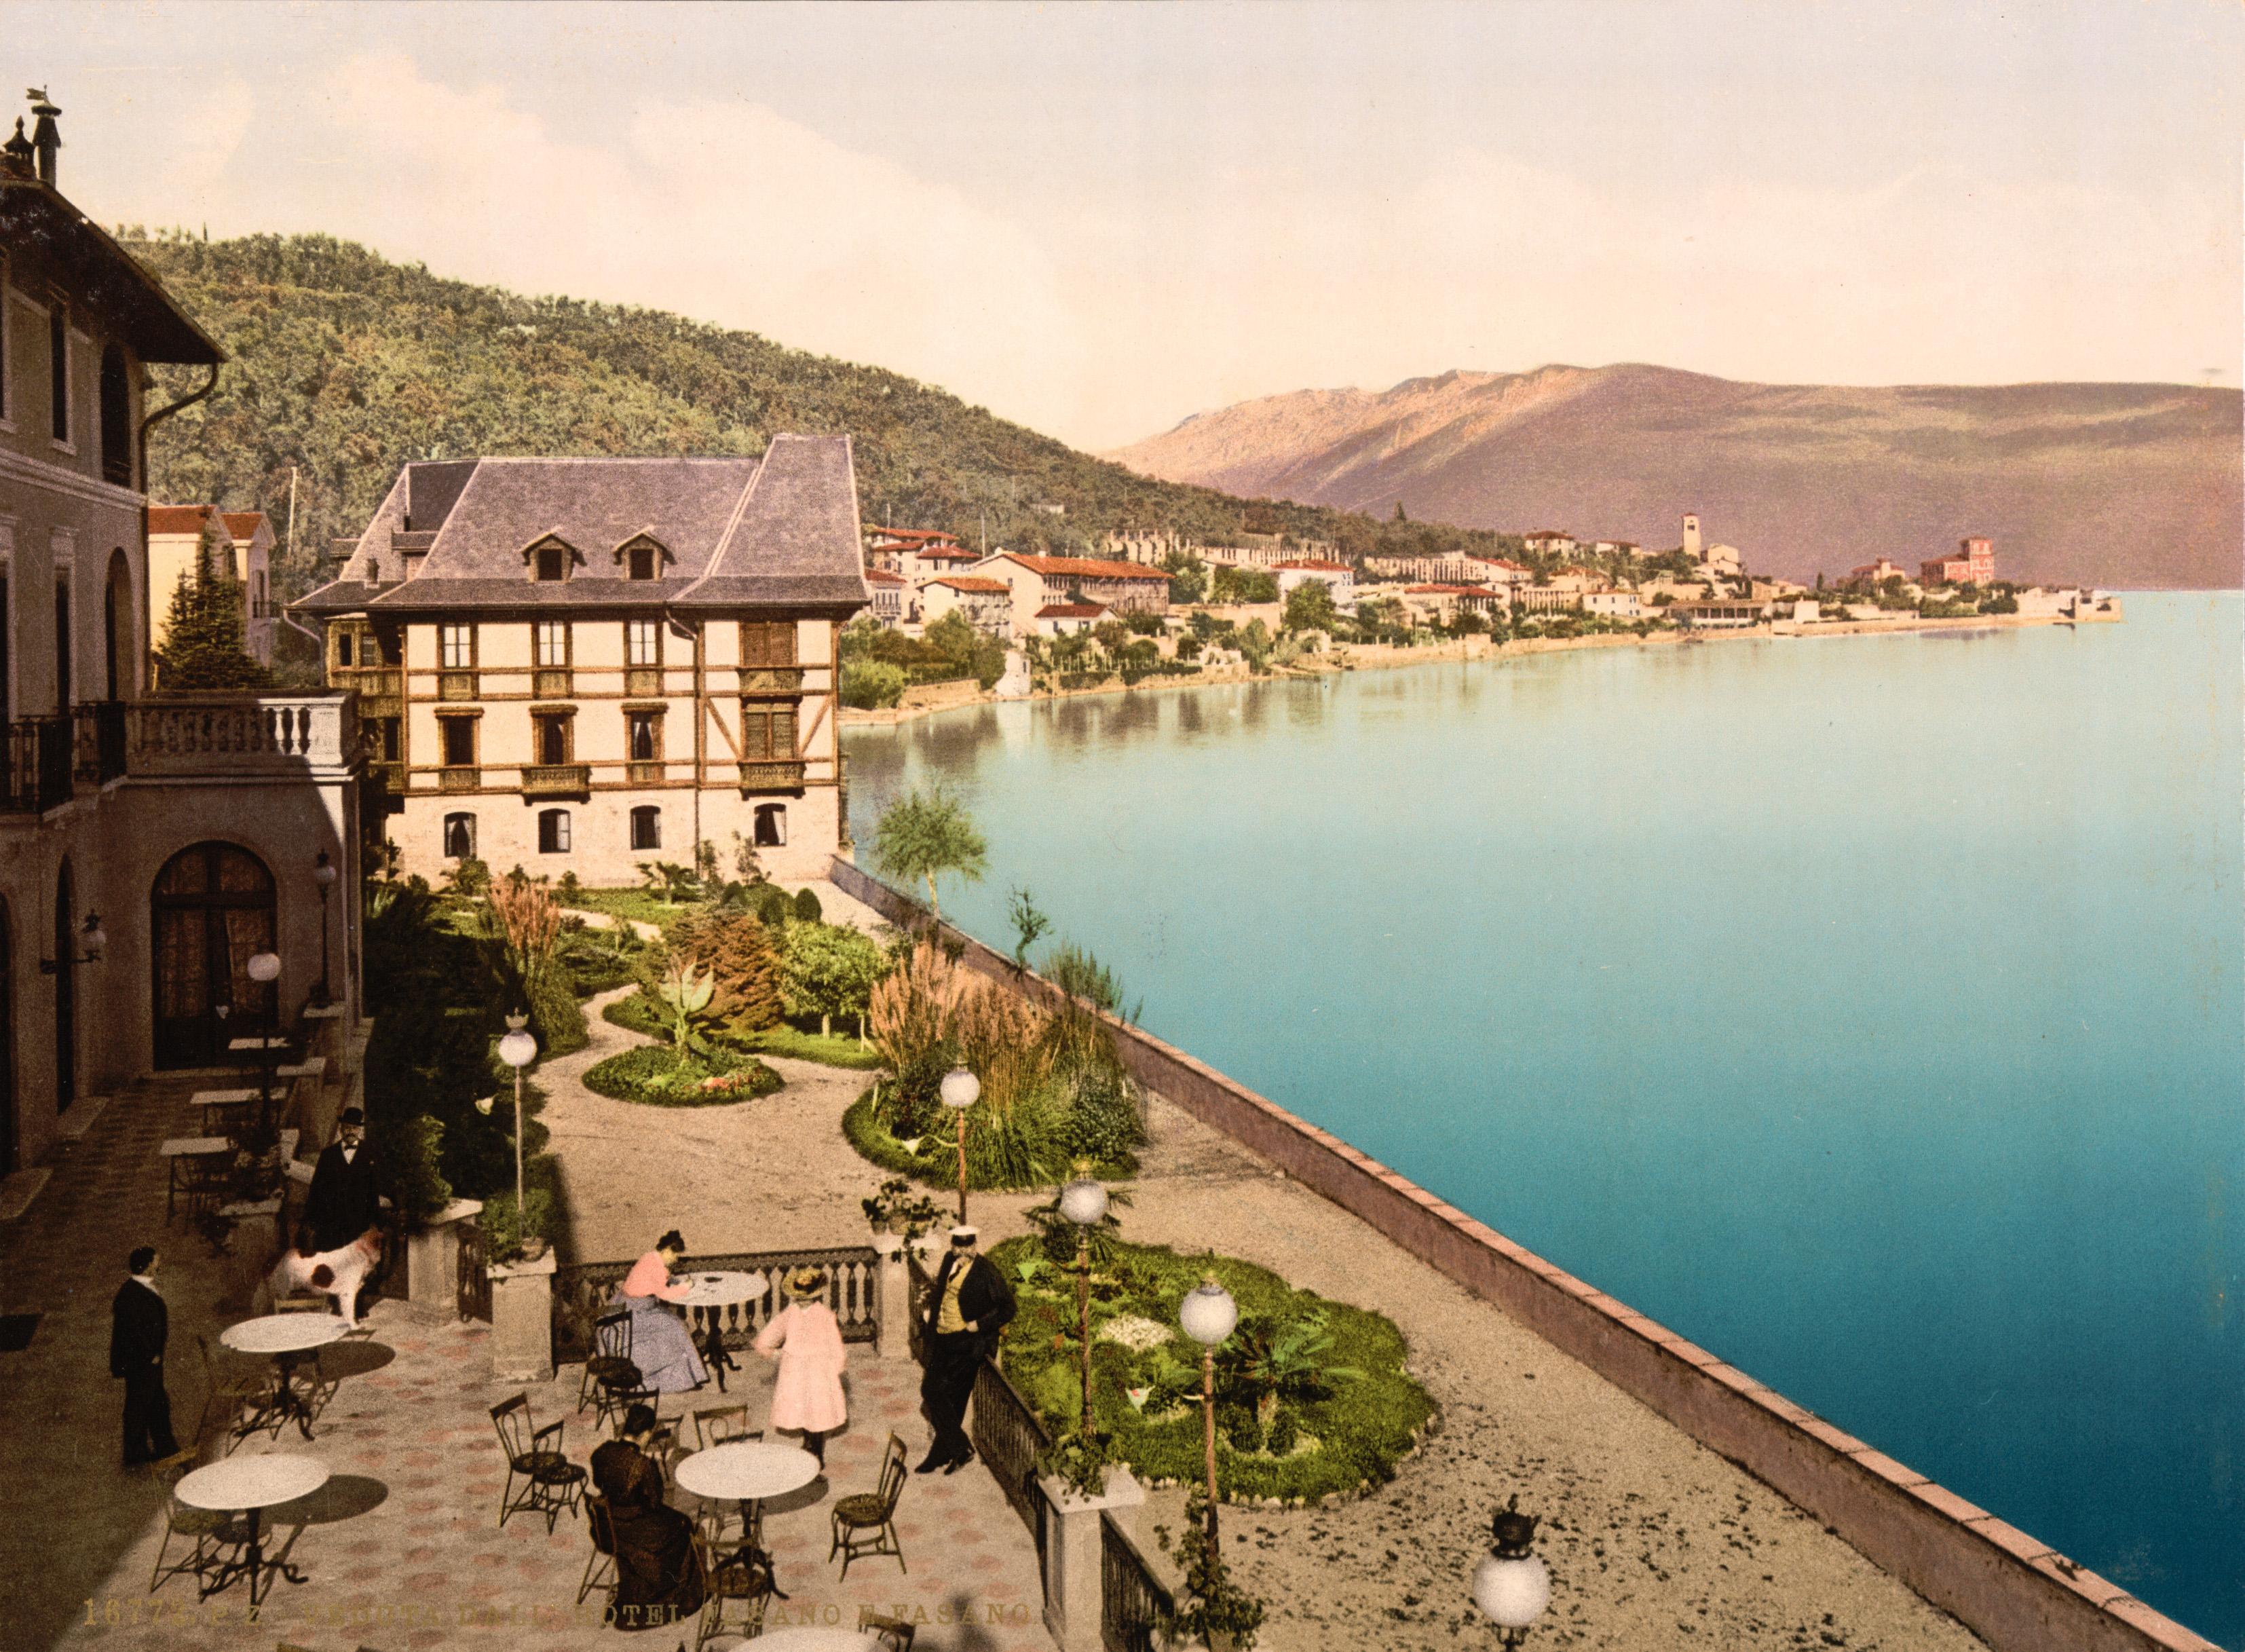 Hotel Lago Di Garda Centro Benebere